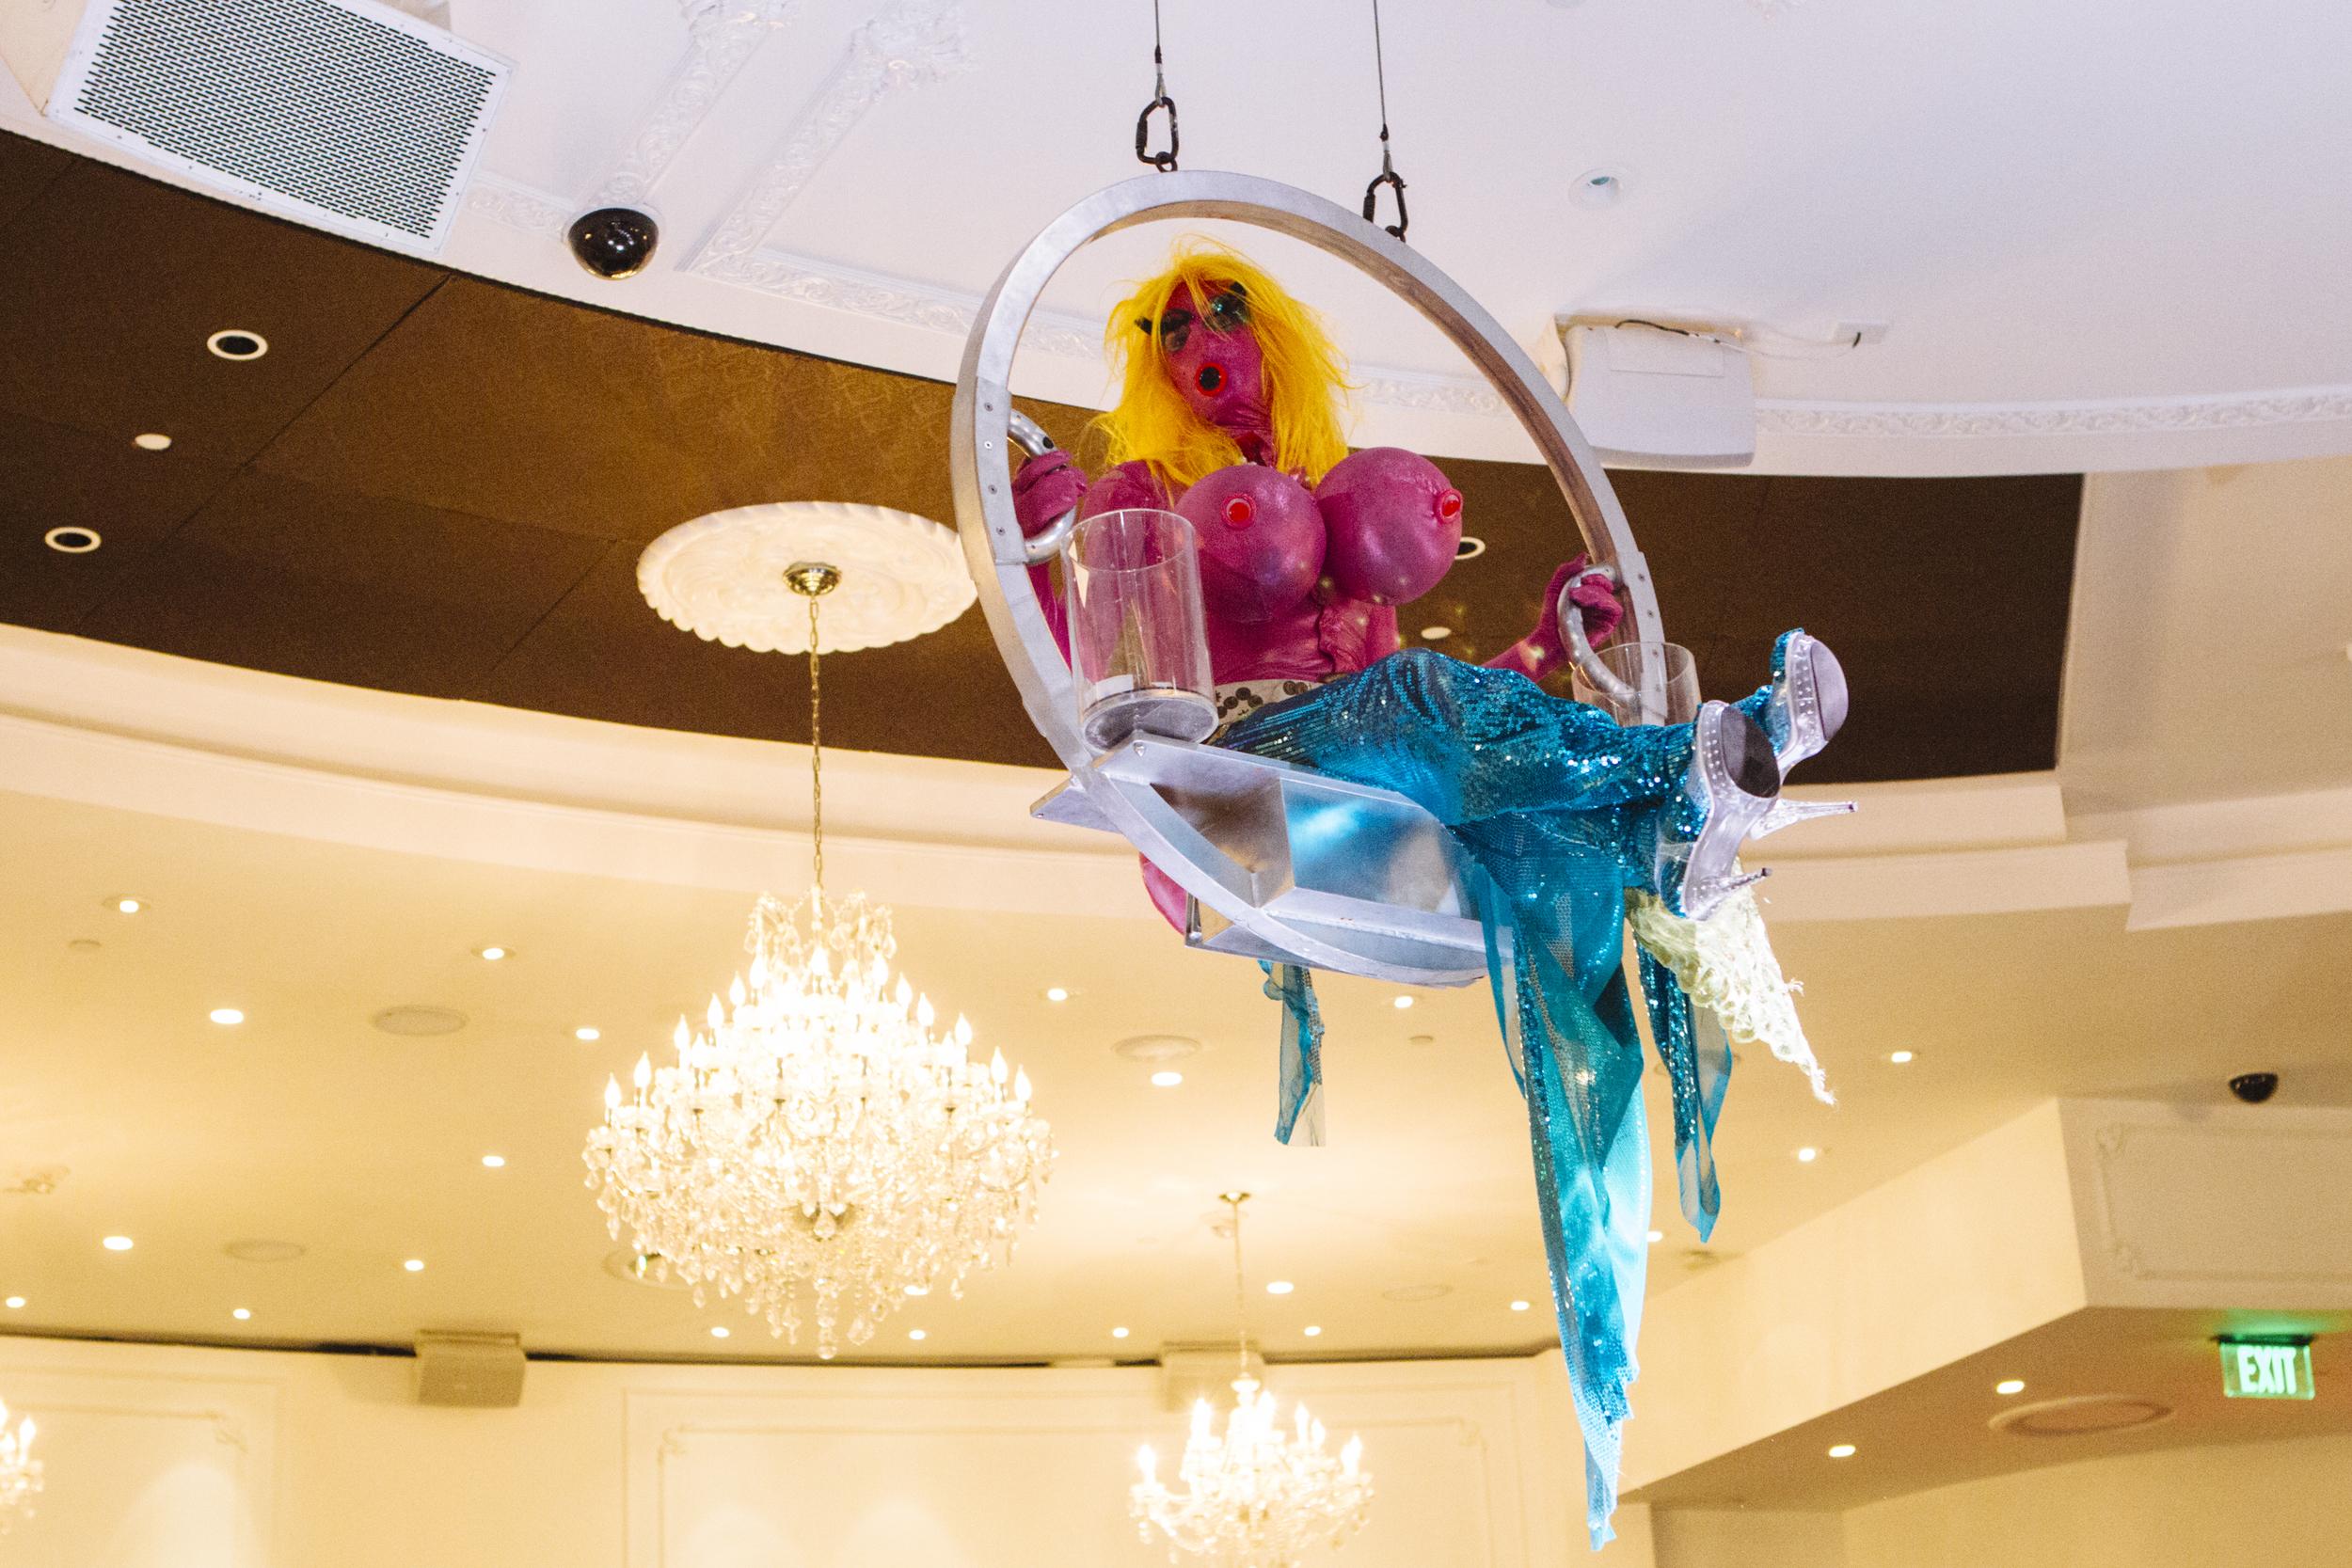 AARON SHEPPARD 2015 Peformance at The Tropicana, Las Vegas, Nevada. Photo by Mikayla Whitmore